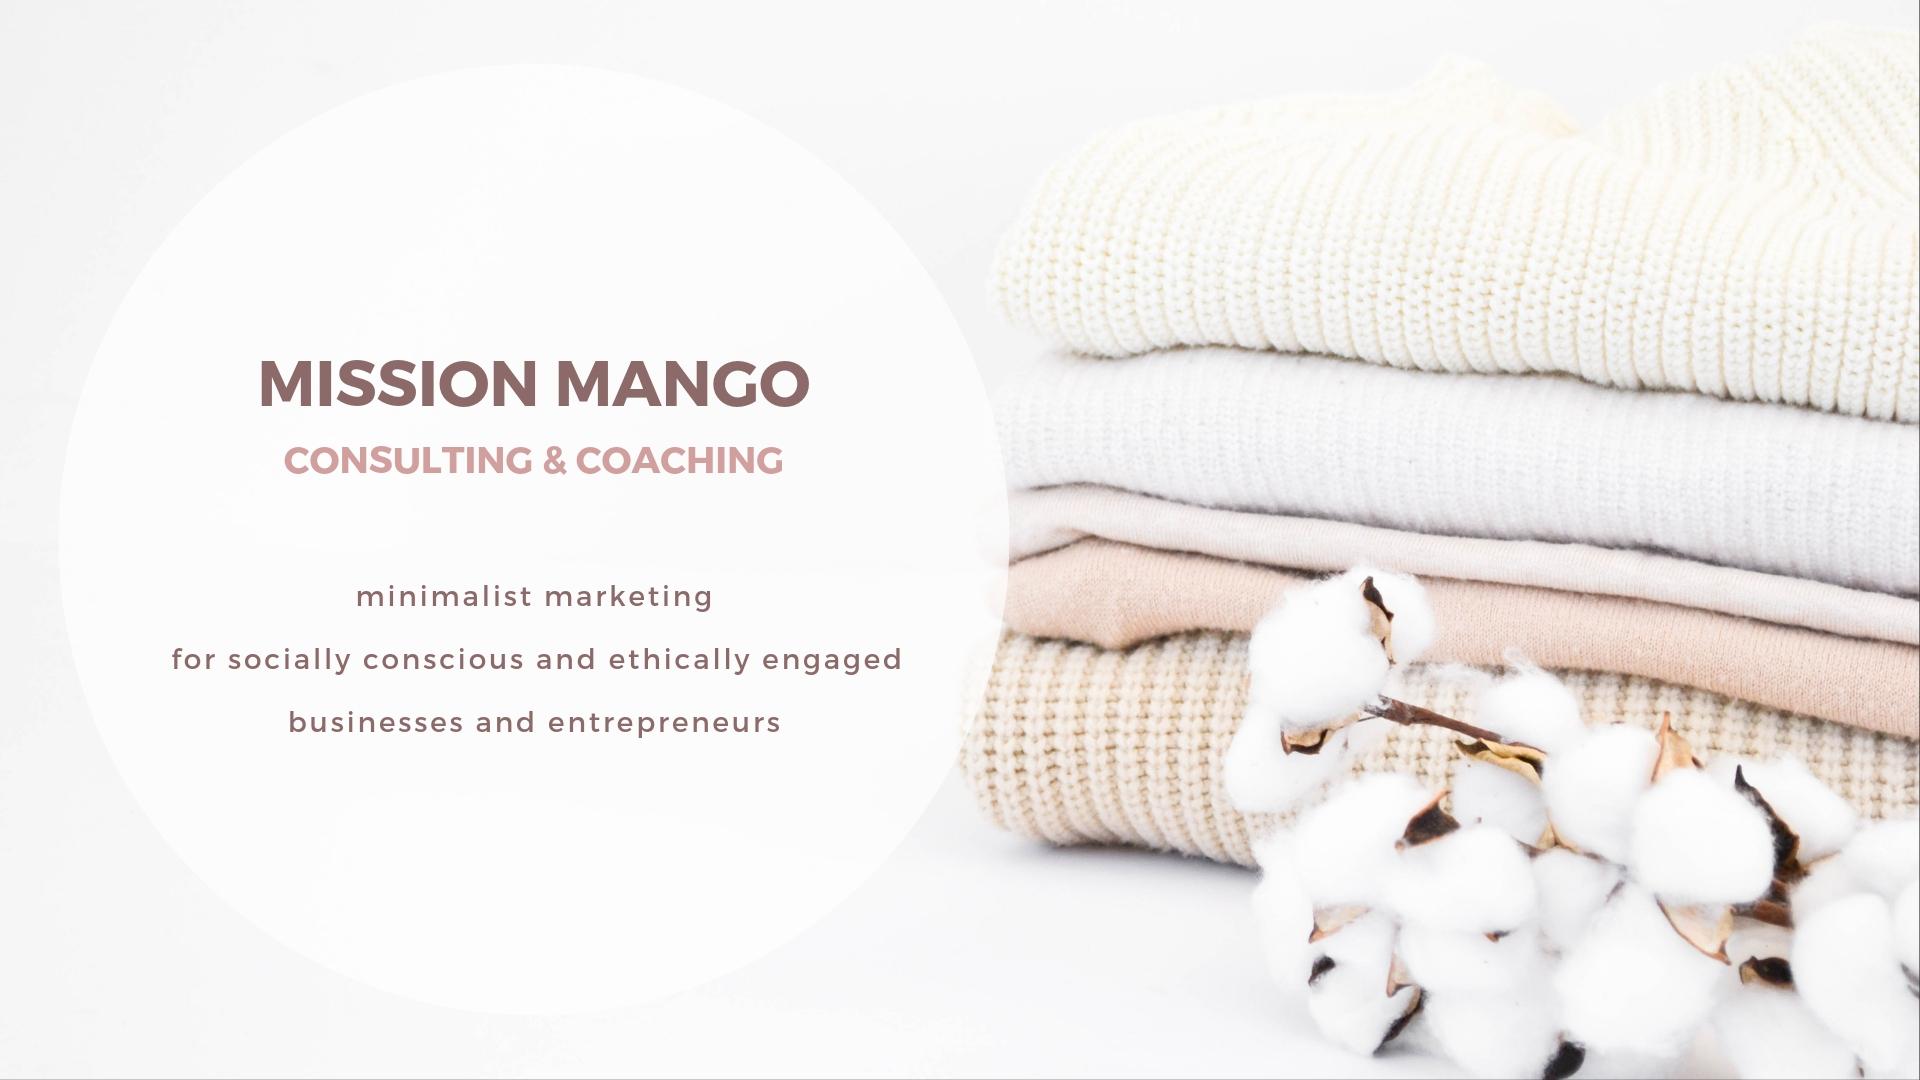 Mission Mango